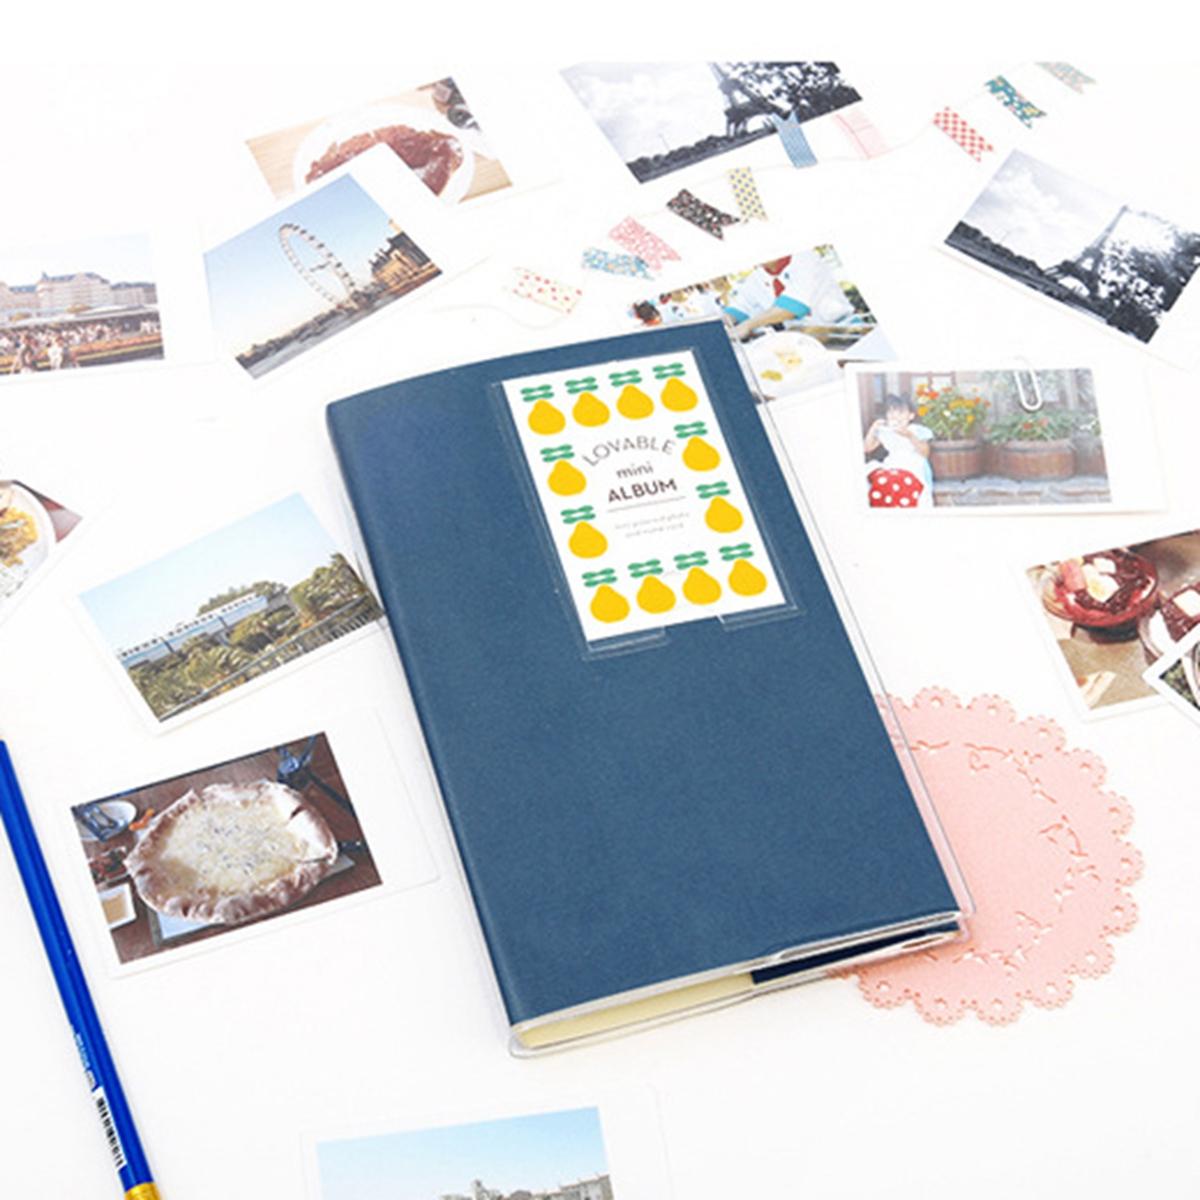 84 pockets storage album case mini film size photo for polaroid fujifilm instax ebay. Black Bedroom Furniture Sets. Home Design Ideas